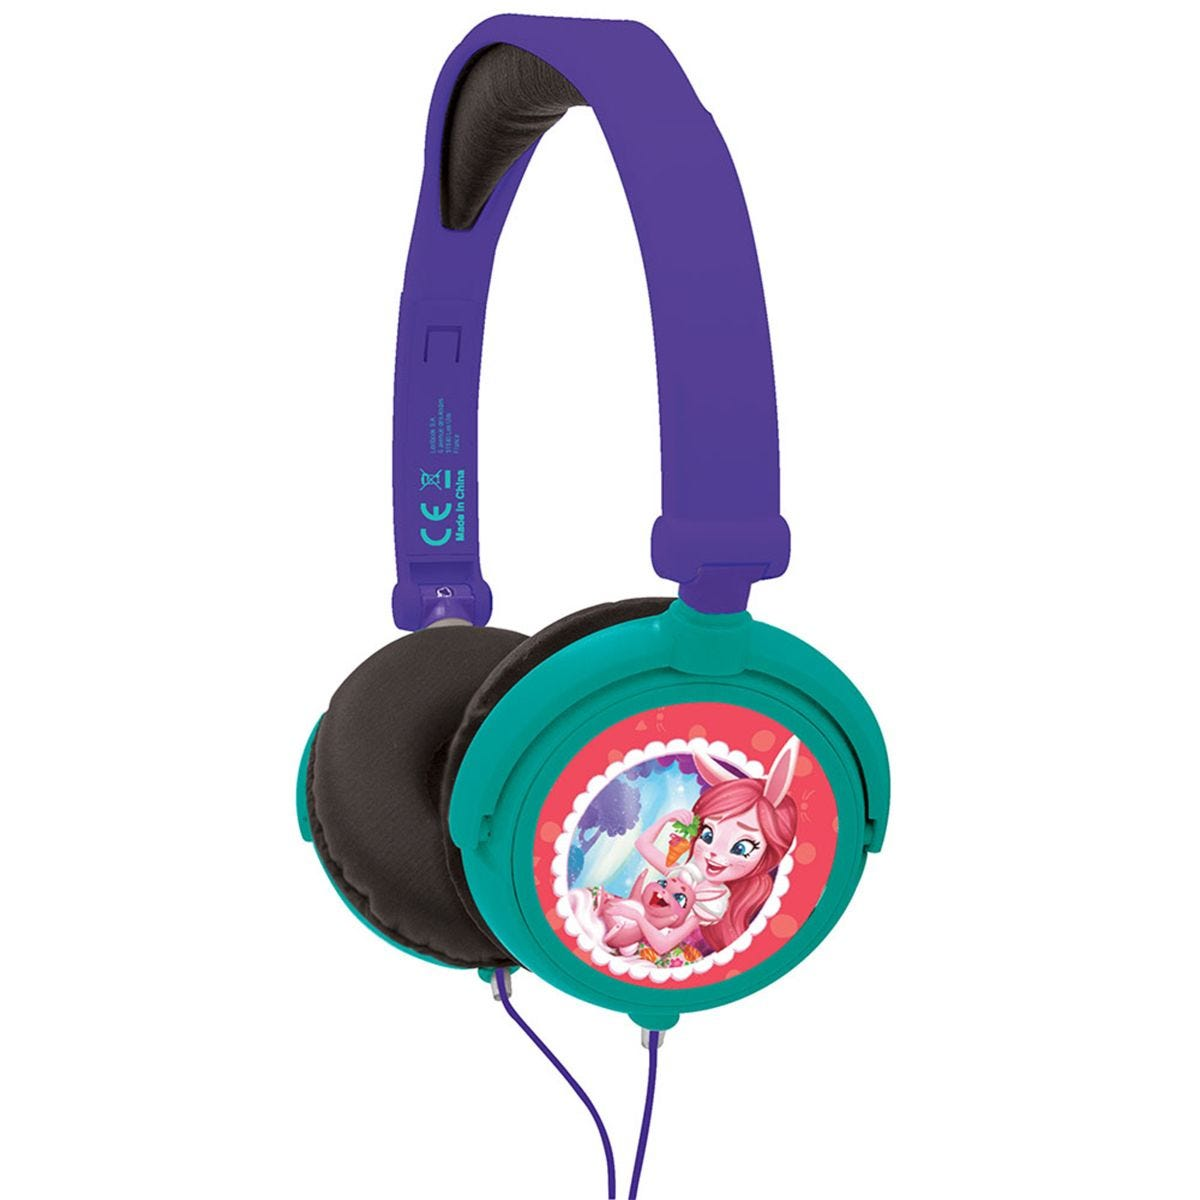 Lexibook Enchantimal Foldable Stereo Headphones with Volume Limiter